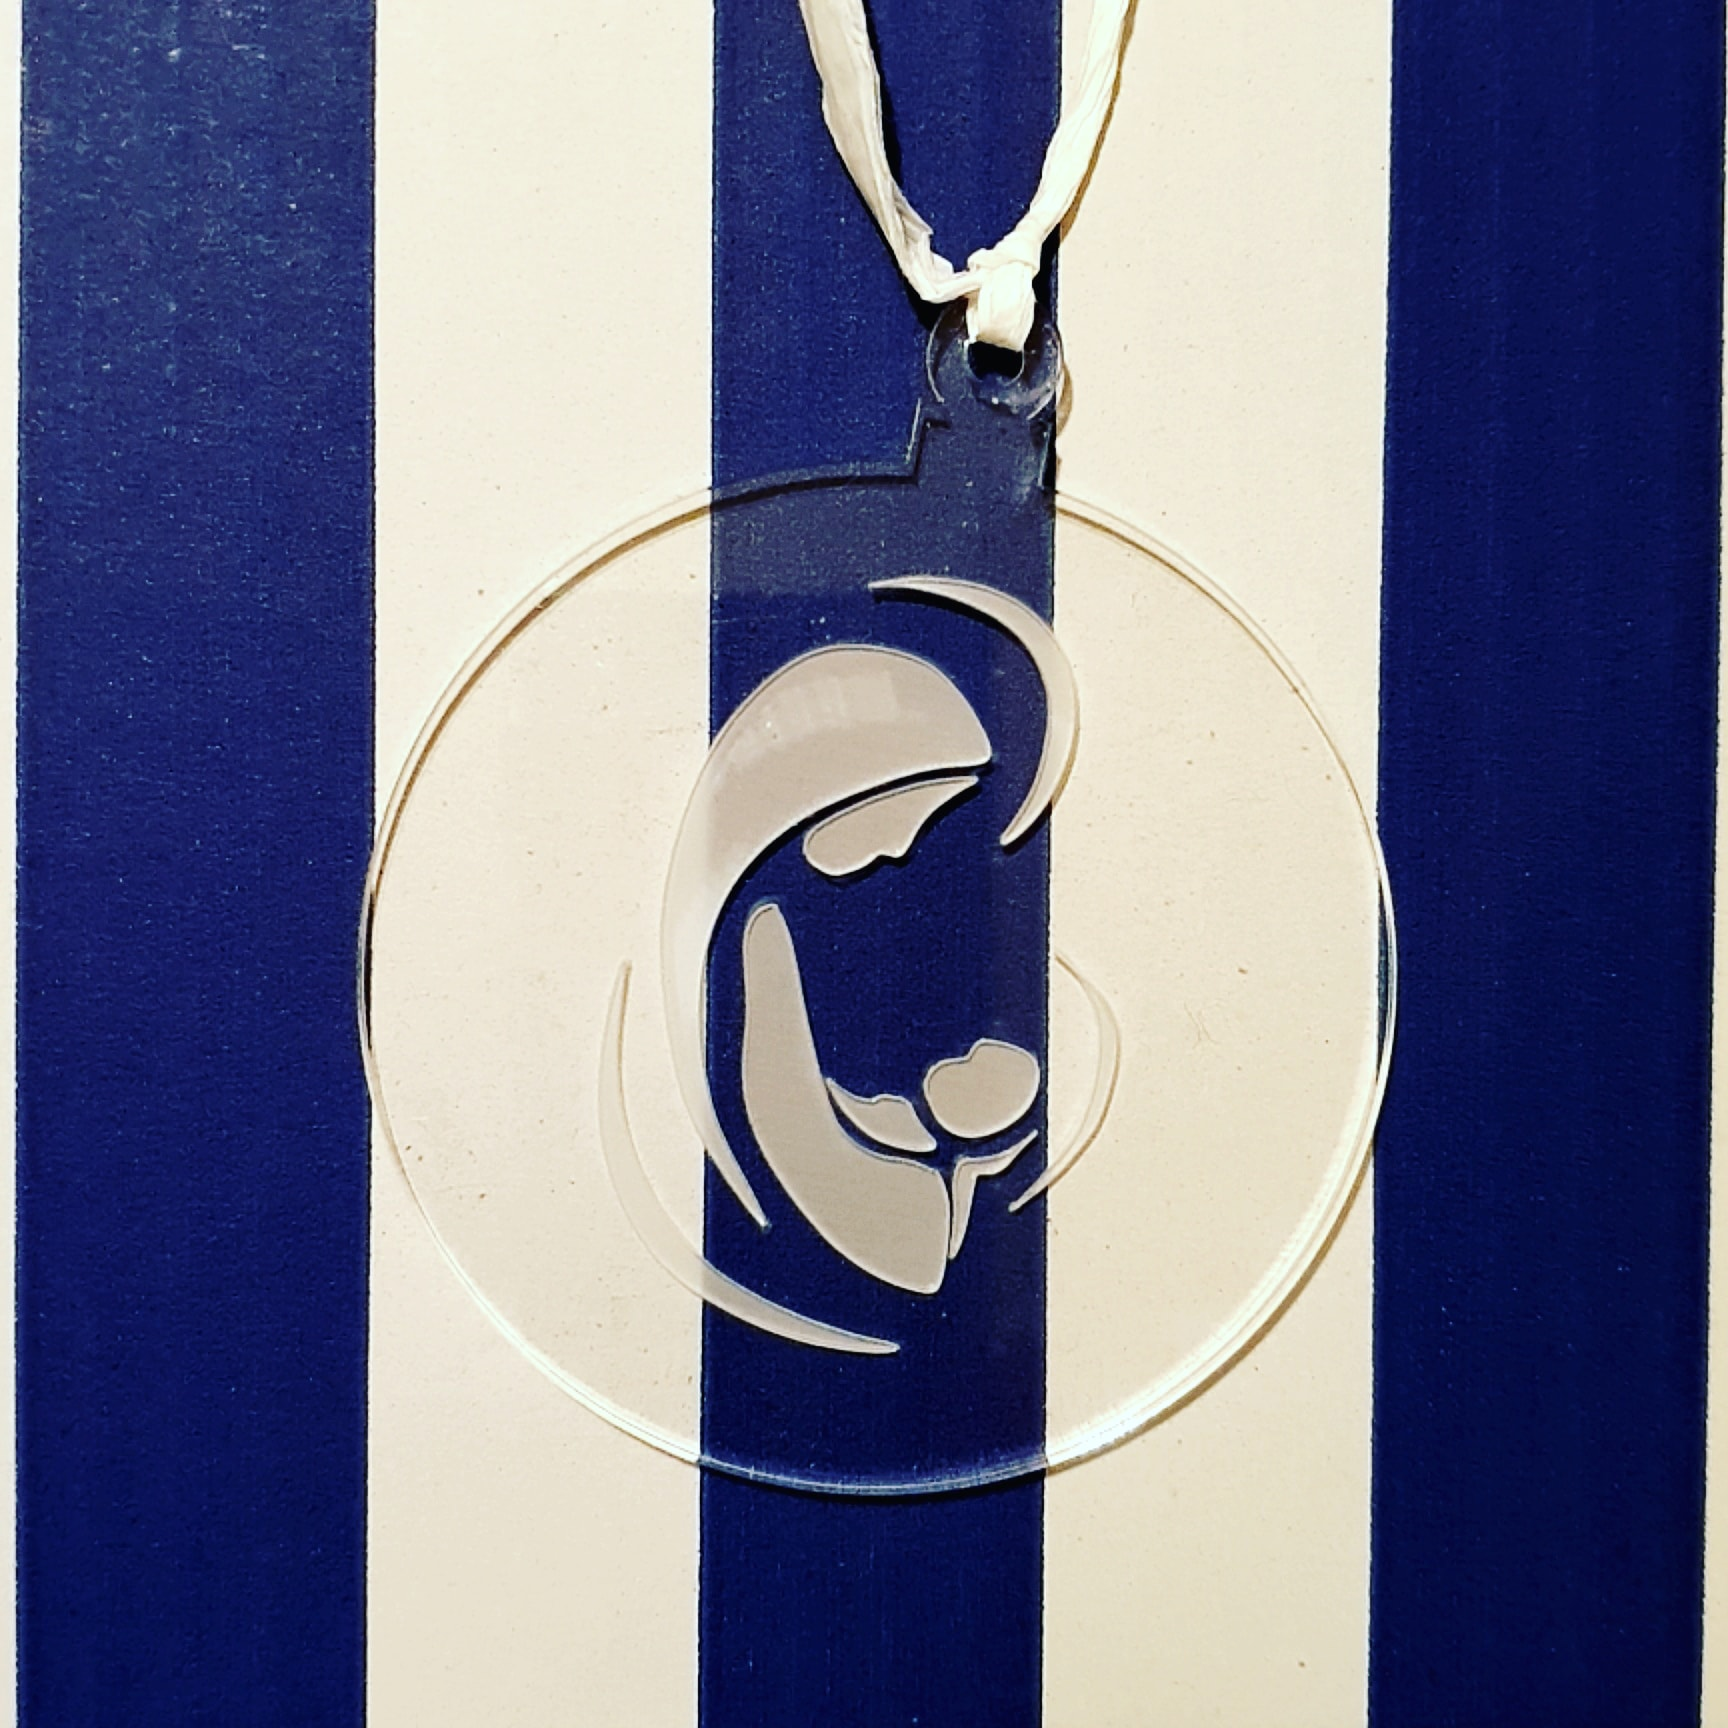 médaille de berceau cristal